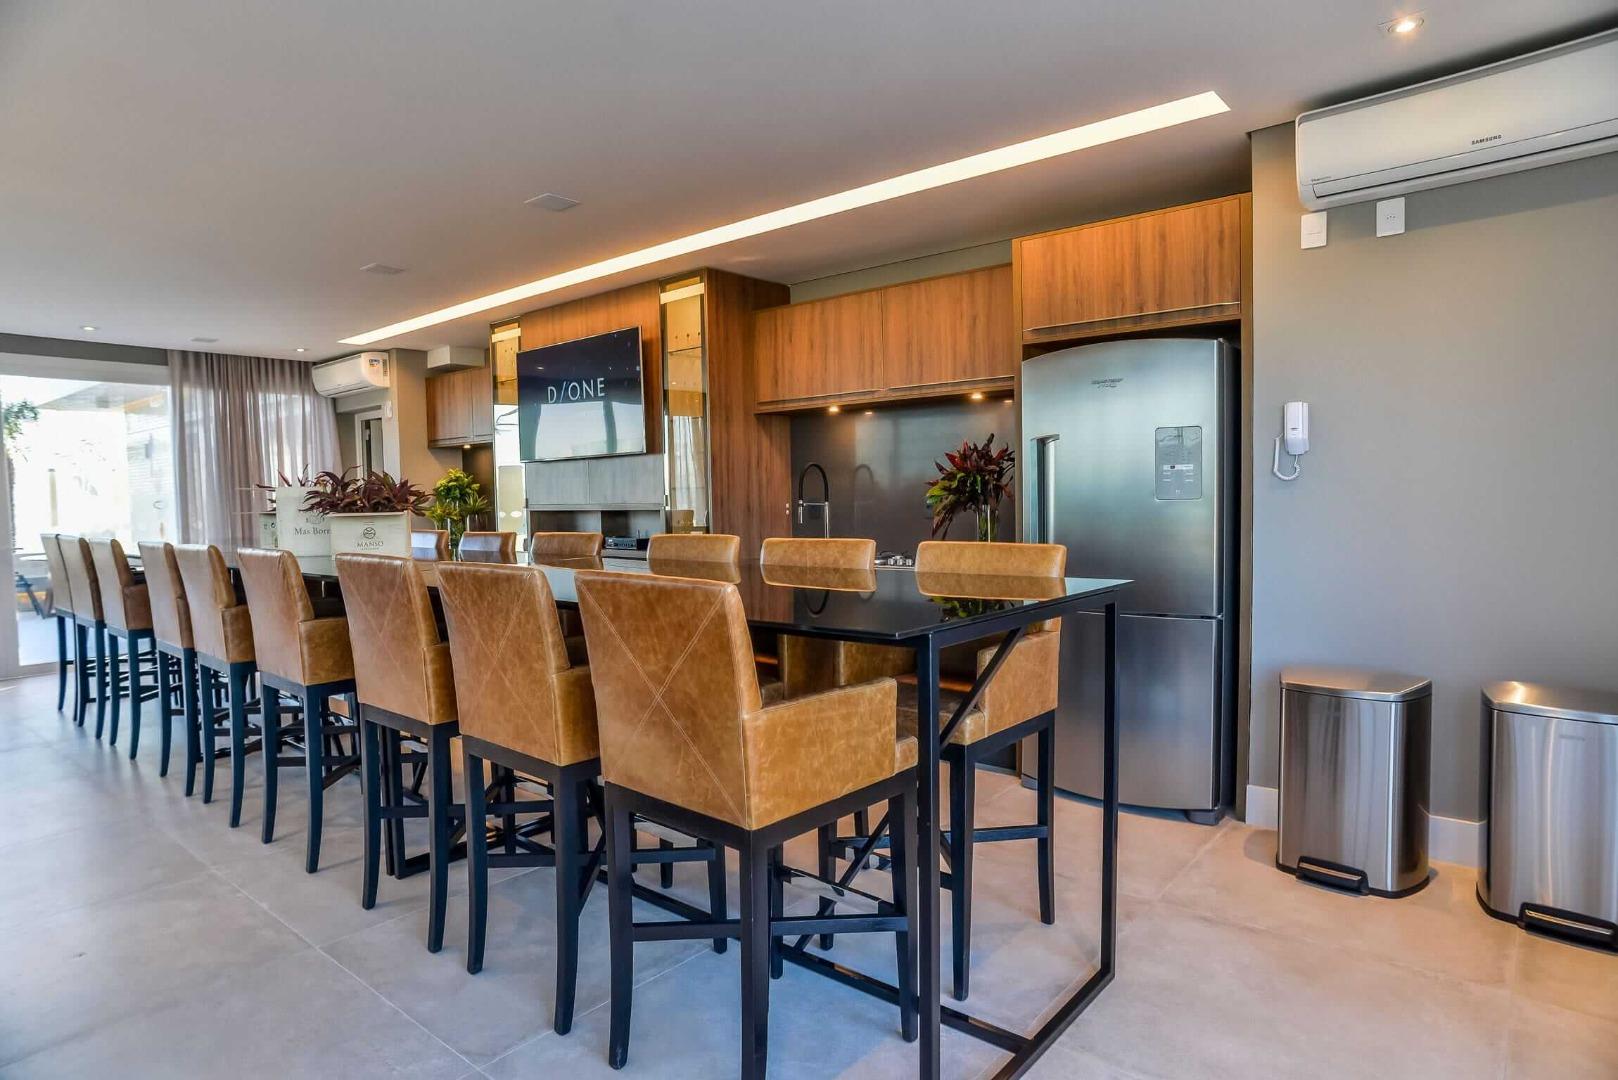 D/One Home Design, foto 5